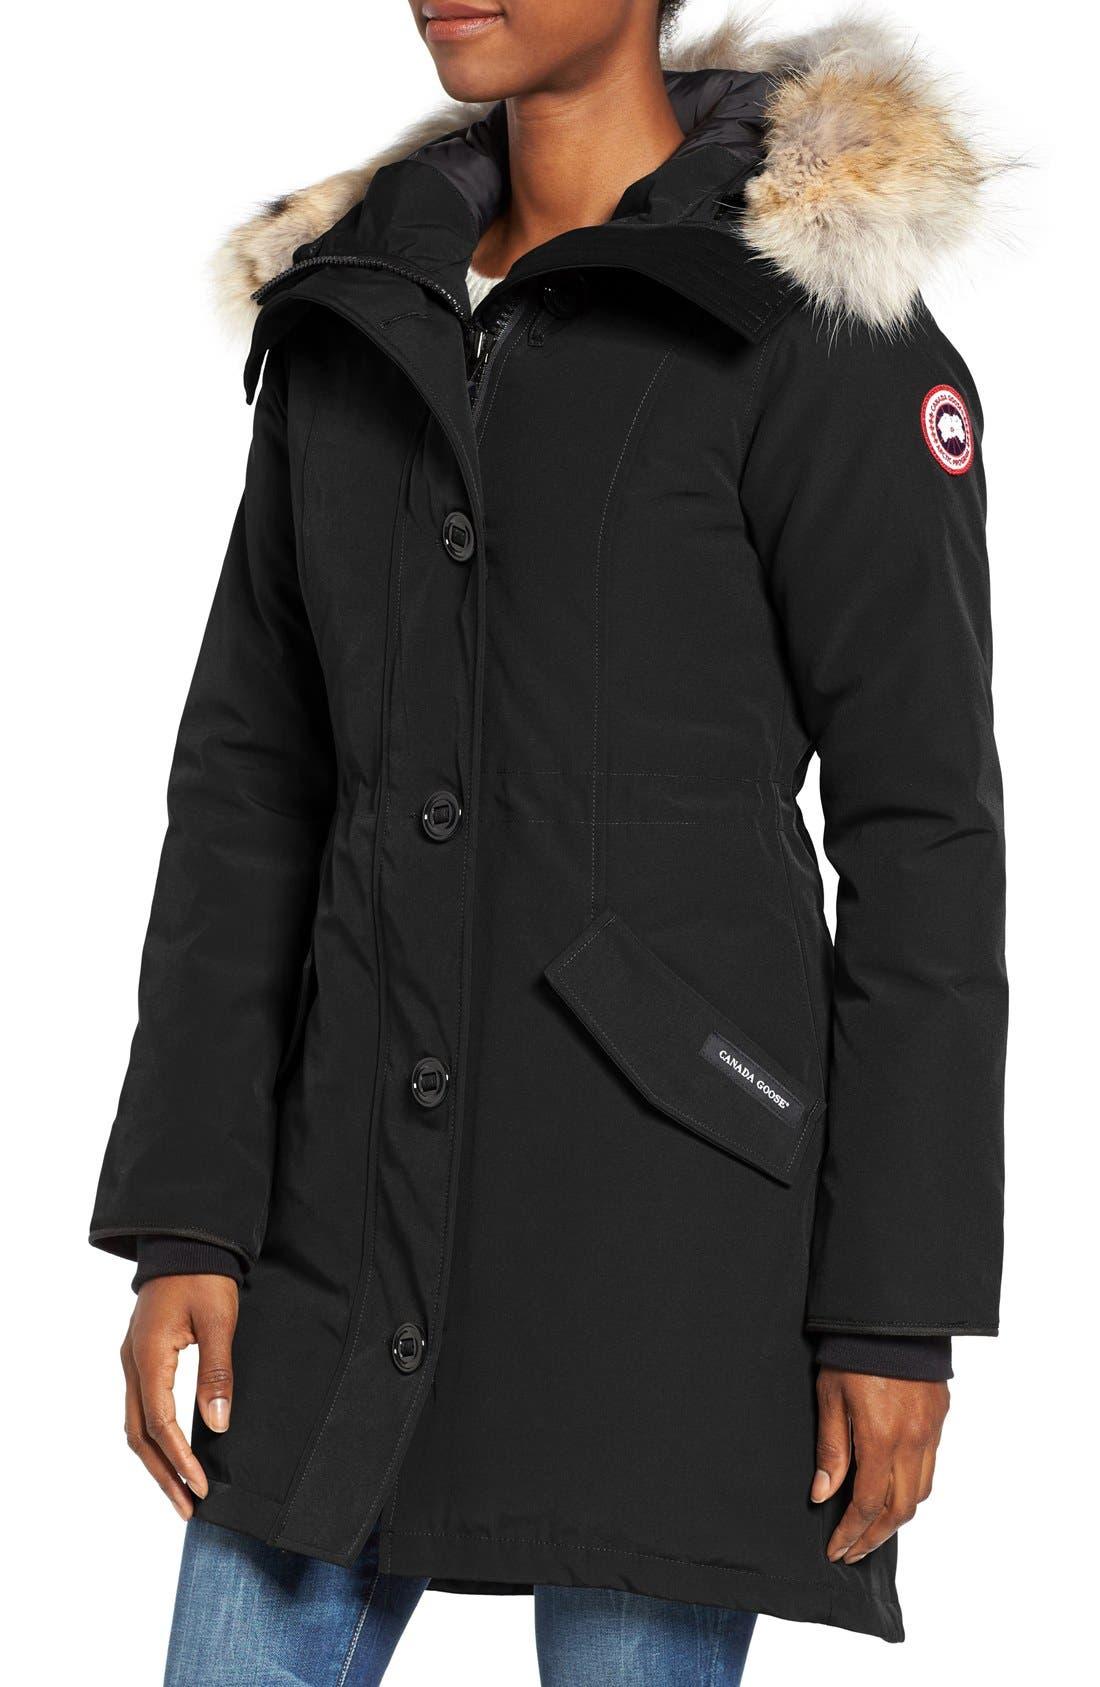 CANADA GOOSE, Rossclair Genuine Coyote Fur Trim Down Parka, Alternate thumbnail 5, color, BLACK